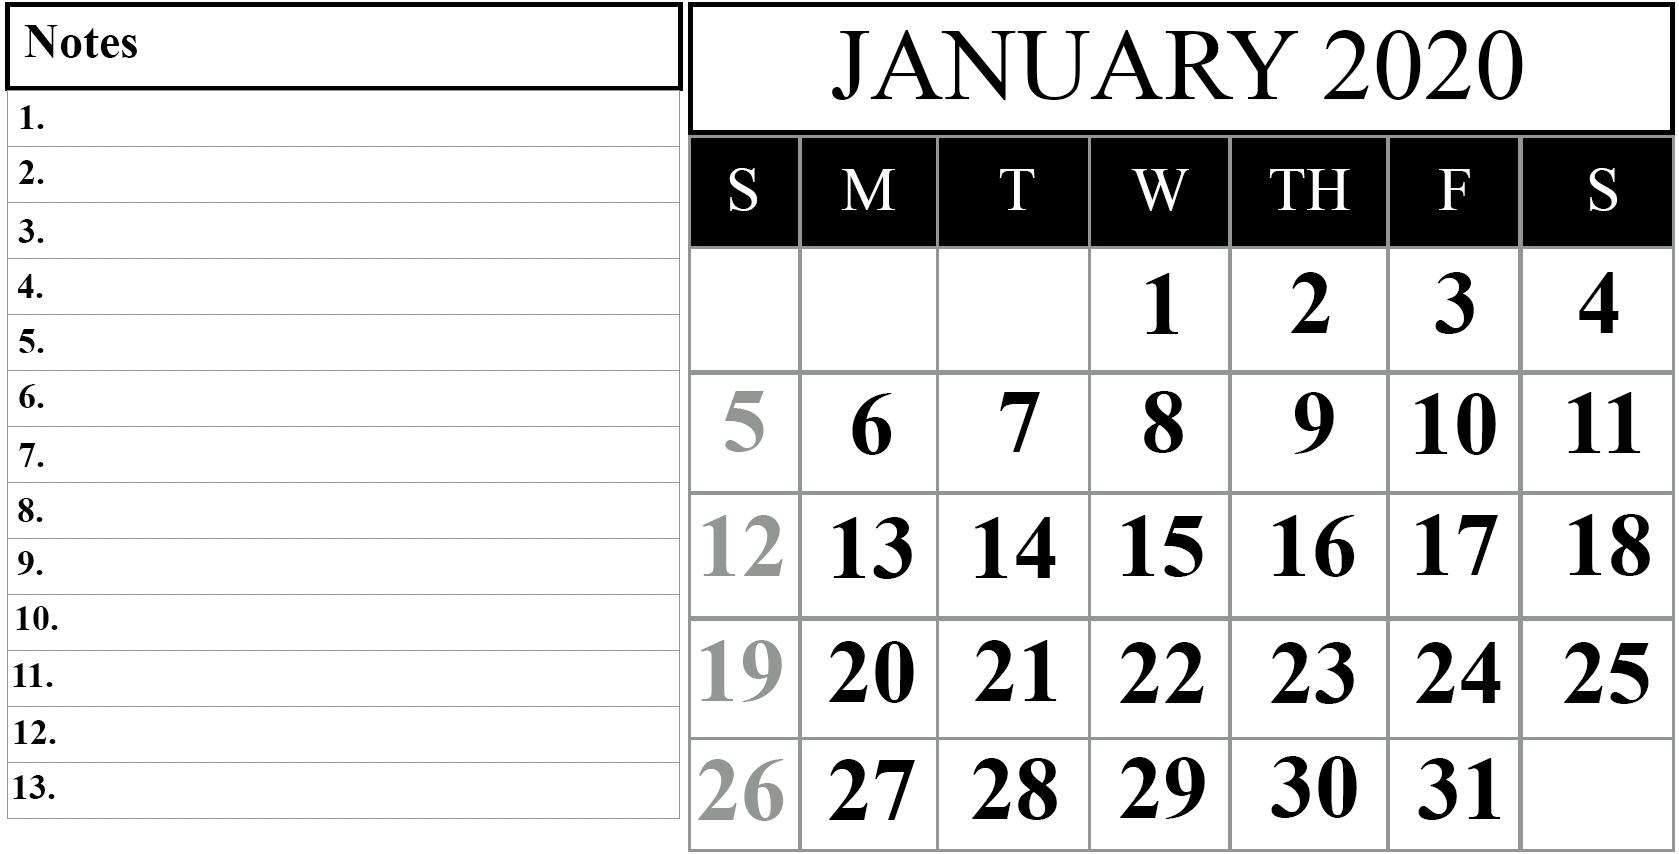 Free January 2020 Printable Calendar In Pdf, Excel & Word-January 2020 Calendar Sri Lanka